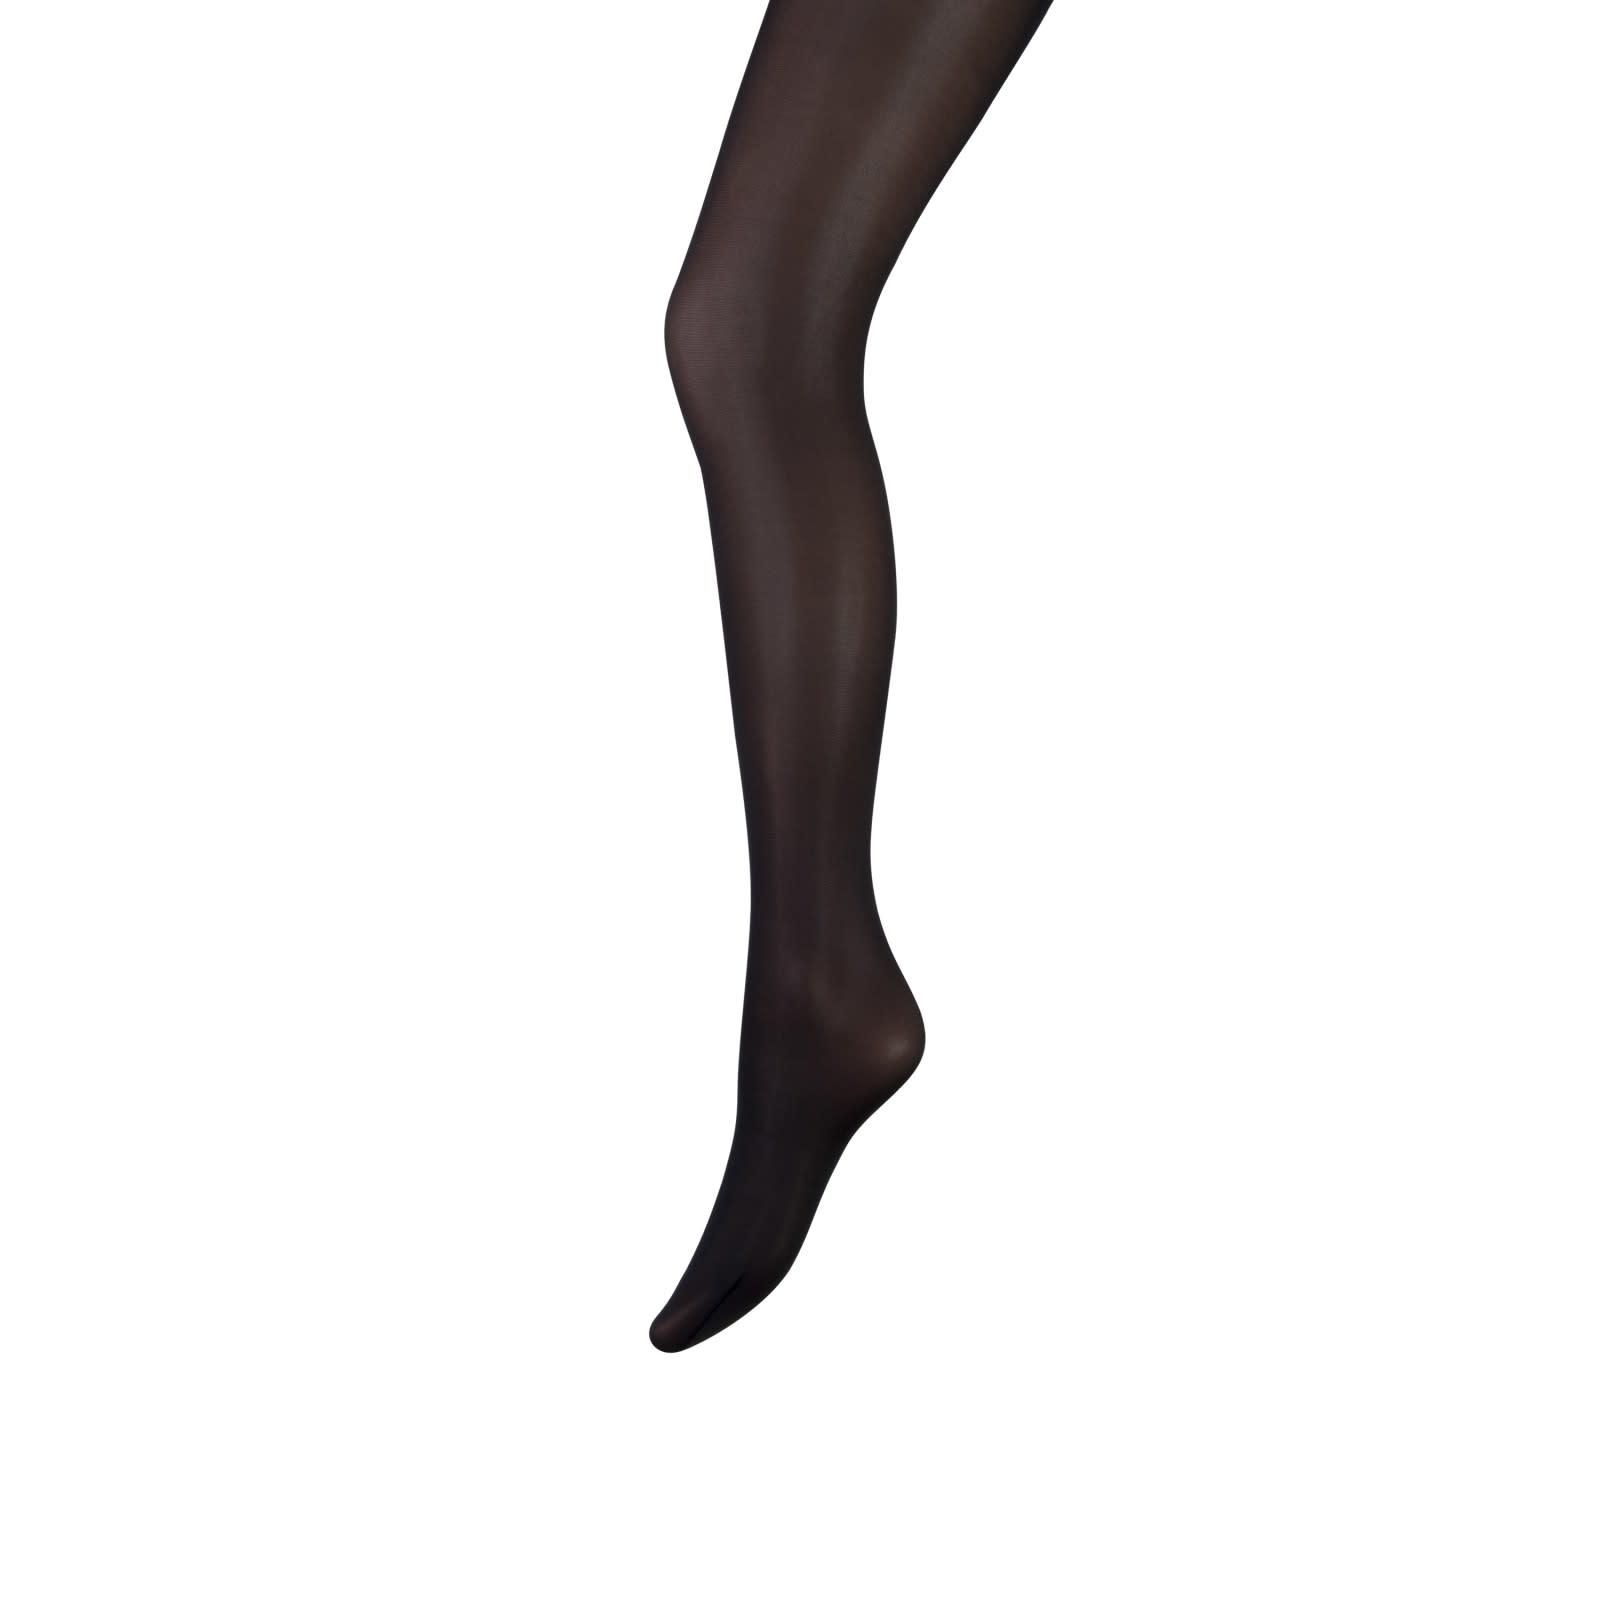 MarcMarcs Dames panty 40 den. Comfort 86045-1